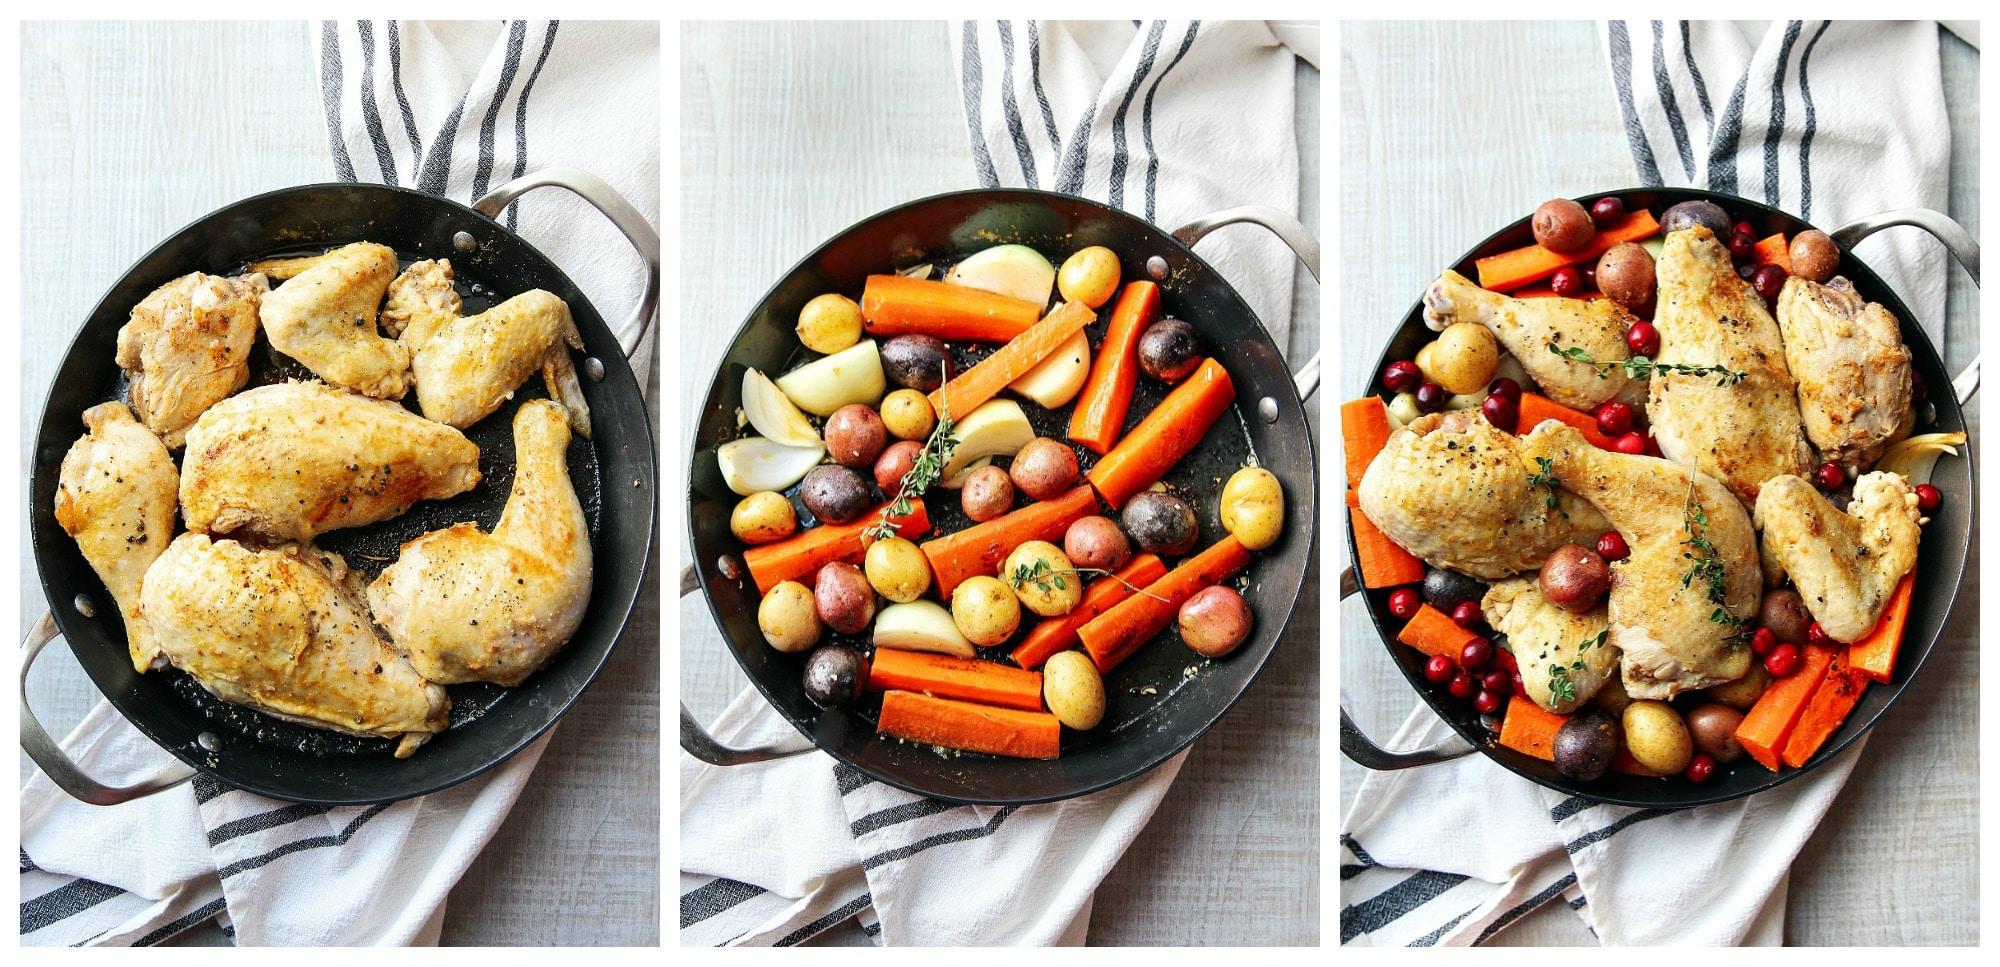 How to Make Chicken Skillet